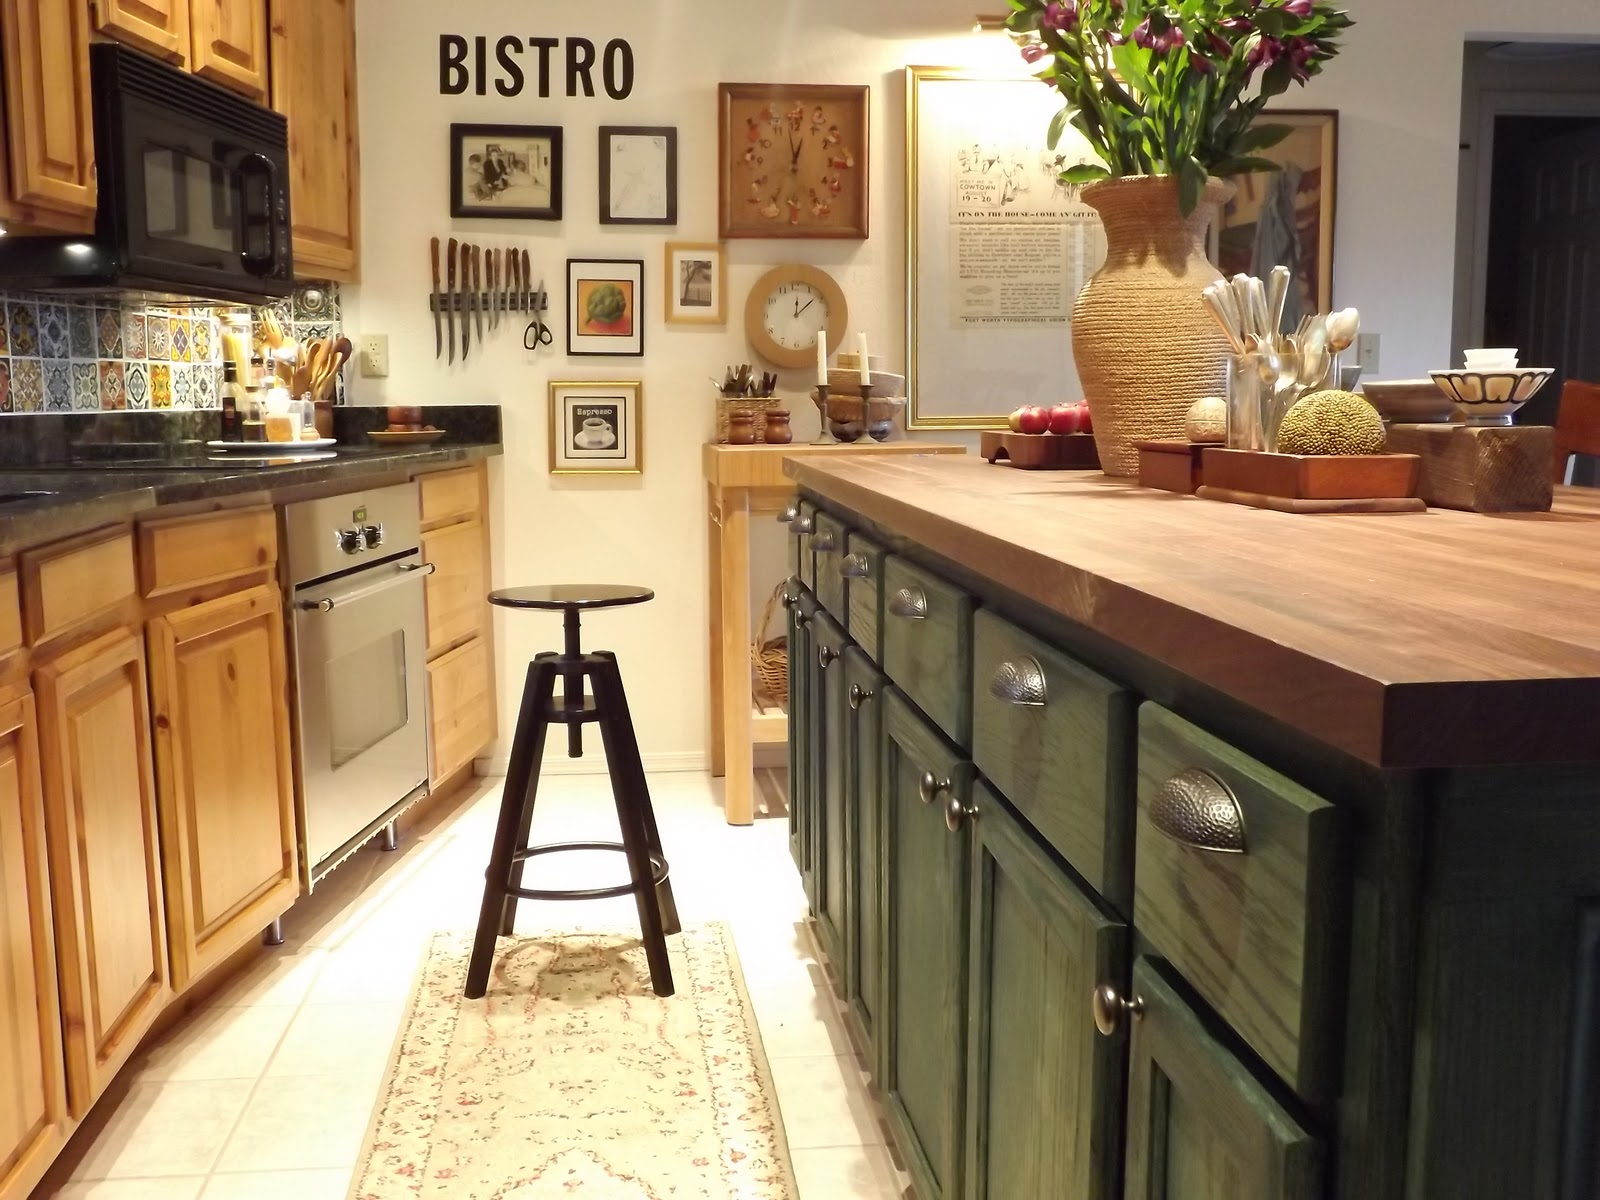 Walnut Countertops, John Boos Countertop, Wood Countertop, Diy Kitchen  Island